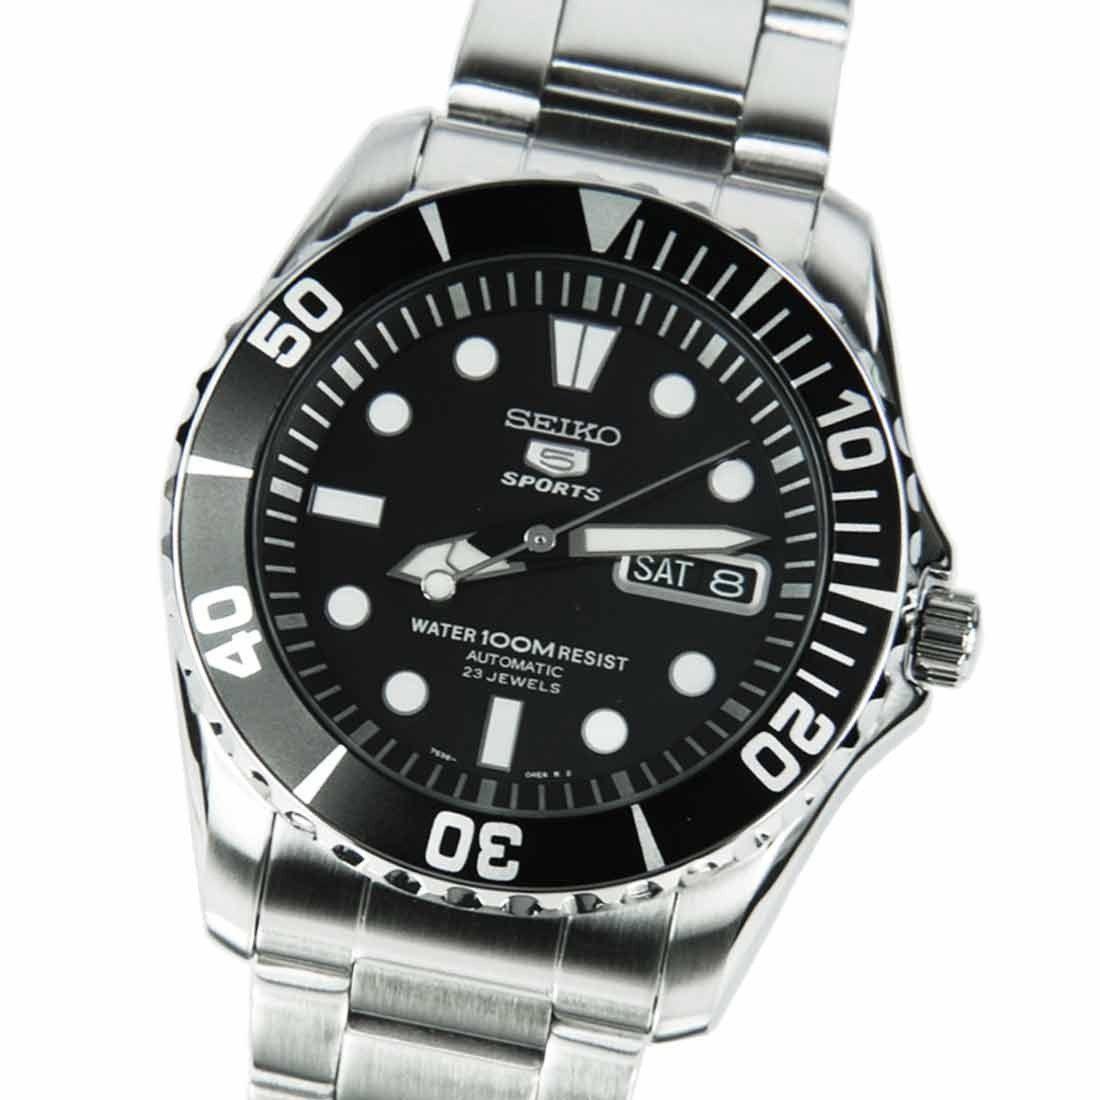 Seiko 5 automatic divers watch SNZF17K1 SNZF17K SNZF17